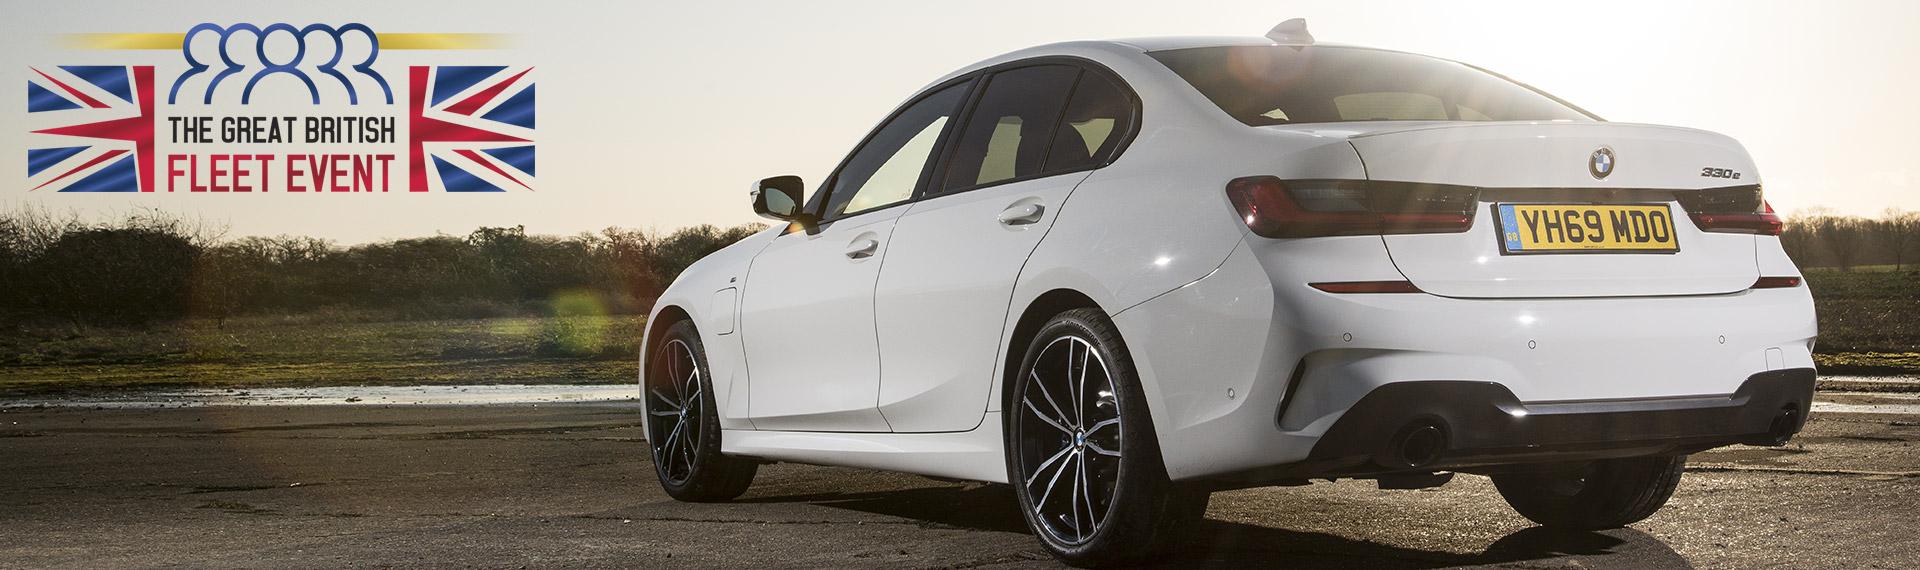 BMW 3 Series Saloon three-quarter rearview.